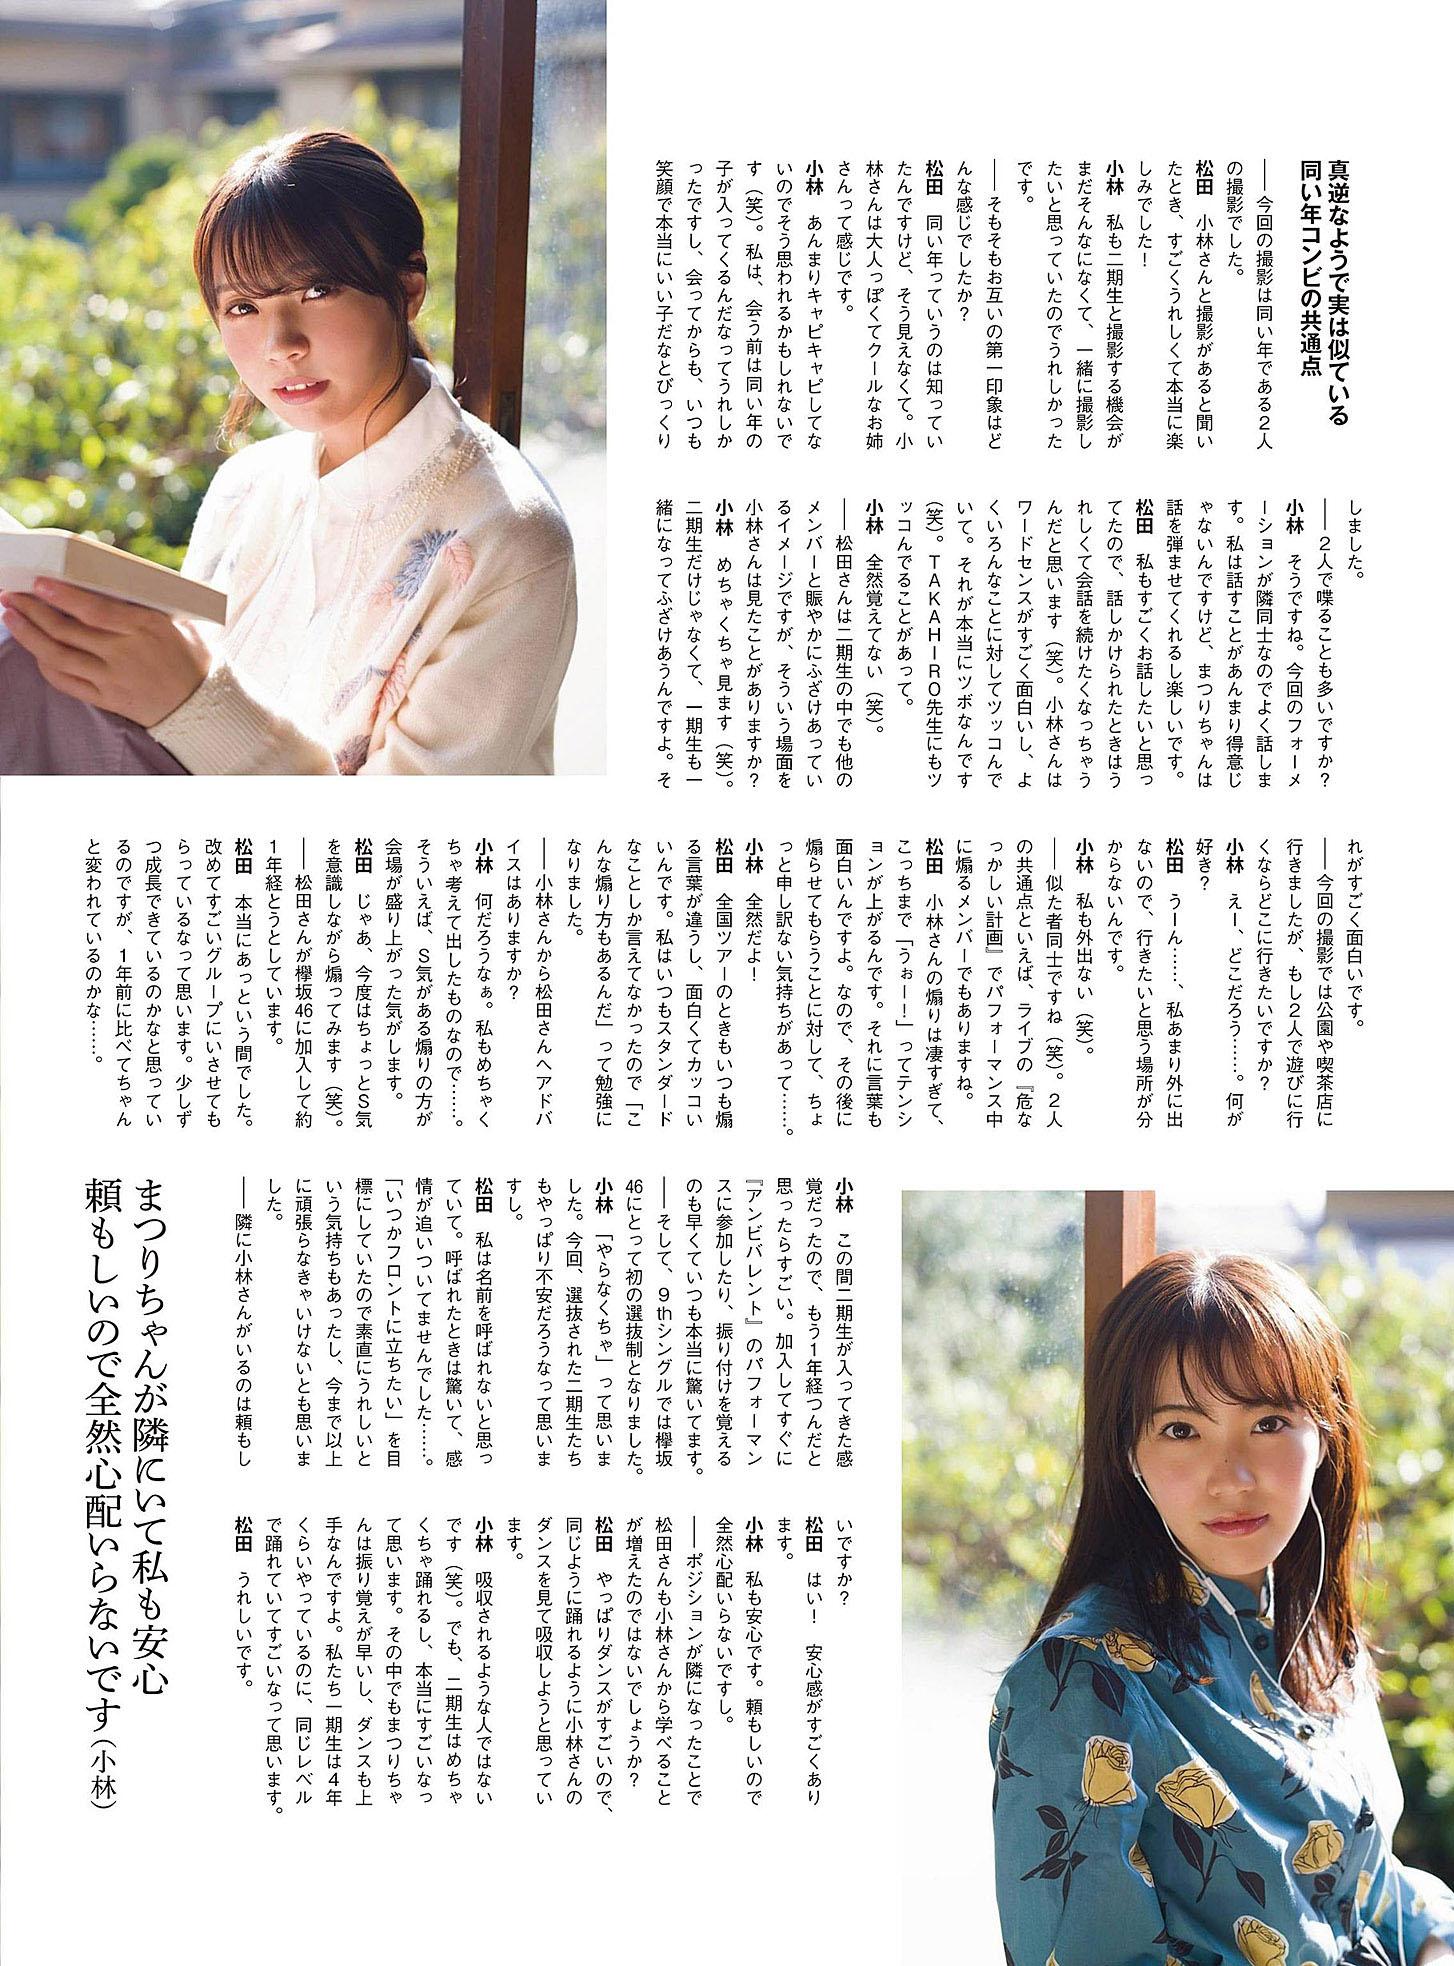 YKobayashi RMatsuda K46 EnTame 2001 11.jpg